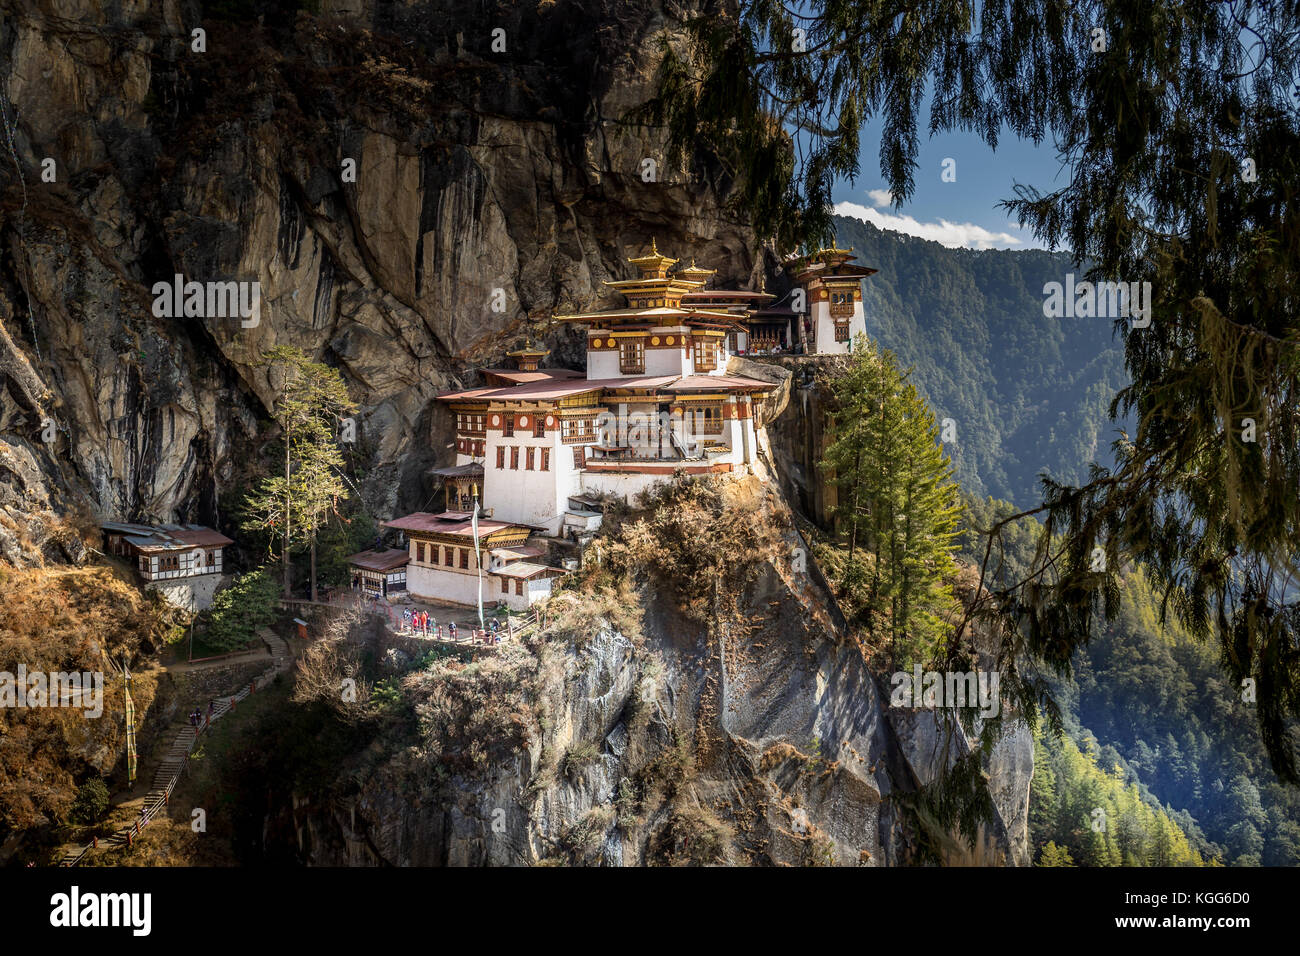 Famous Tiger's Nest monastery near Paro, Bhutan - Stock Image